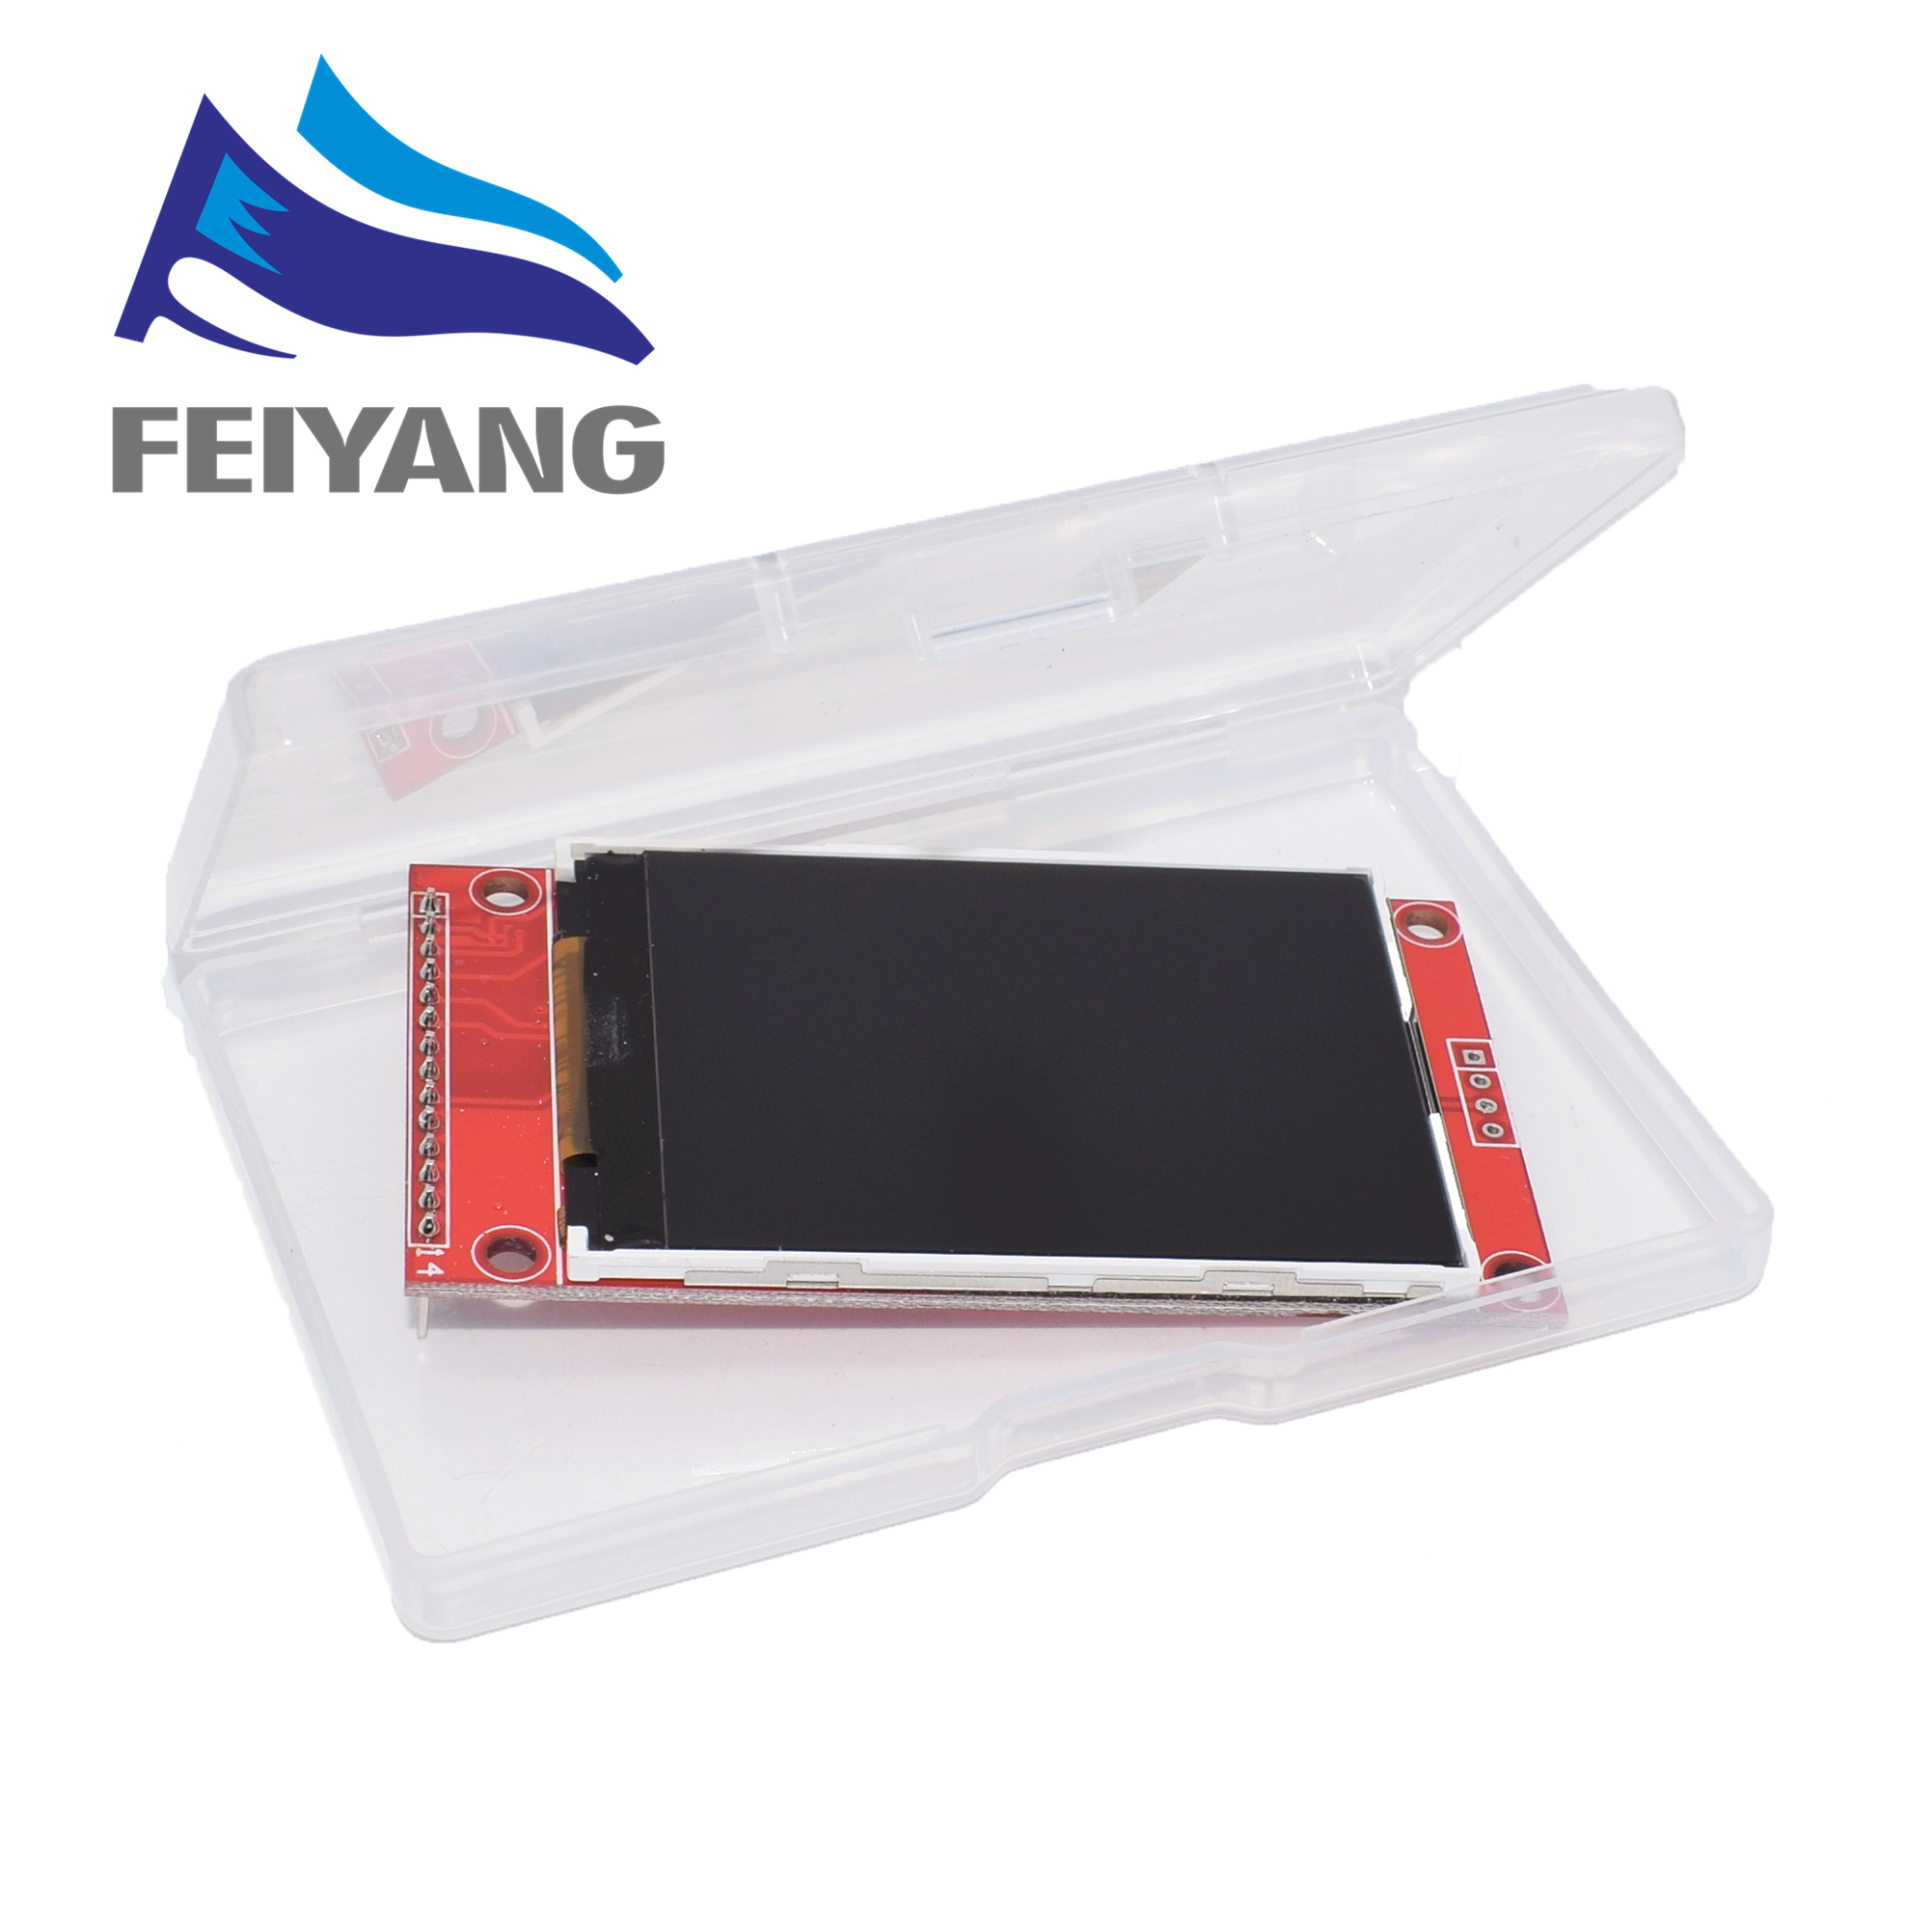 "2.4"" 2.4 Inch 240x320 SPI TFT LCD Serial Port Module 5V/3.3V PCB Adapter Micro SD Card ILI9341 LCD Display White LED"